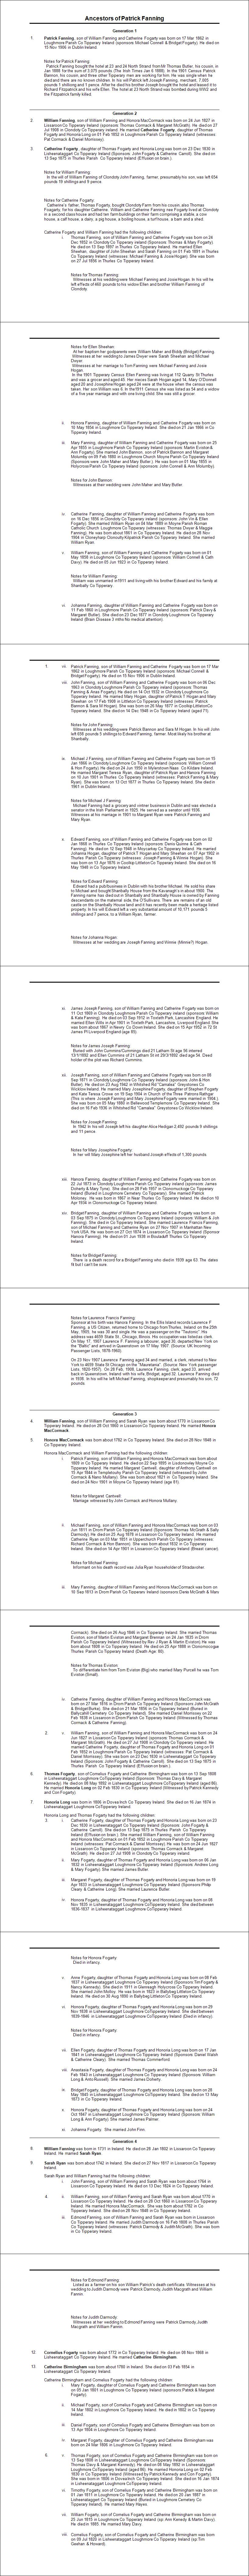 Patrick Fanning Ancestor Report 2015 2